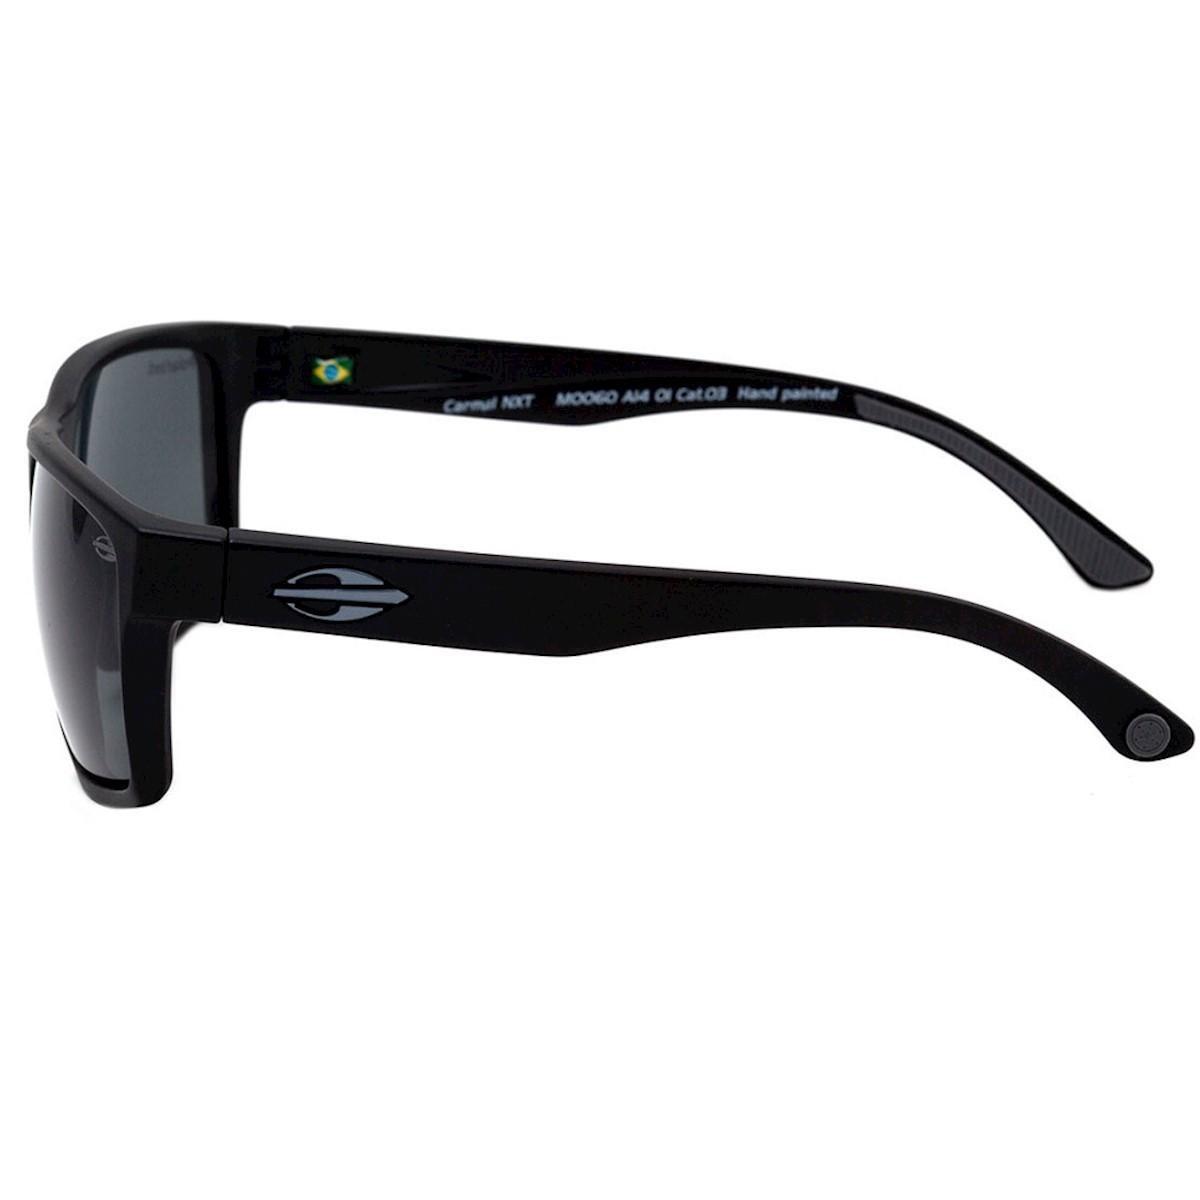 Óculos de Sol Mormaii Carmel Masculino - Preto - Compre Agora   Netshoes 0d951422bb